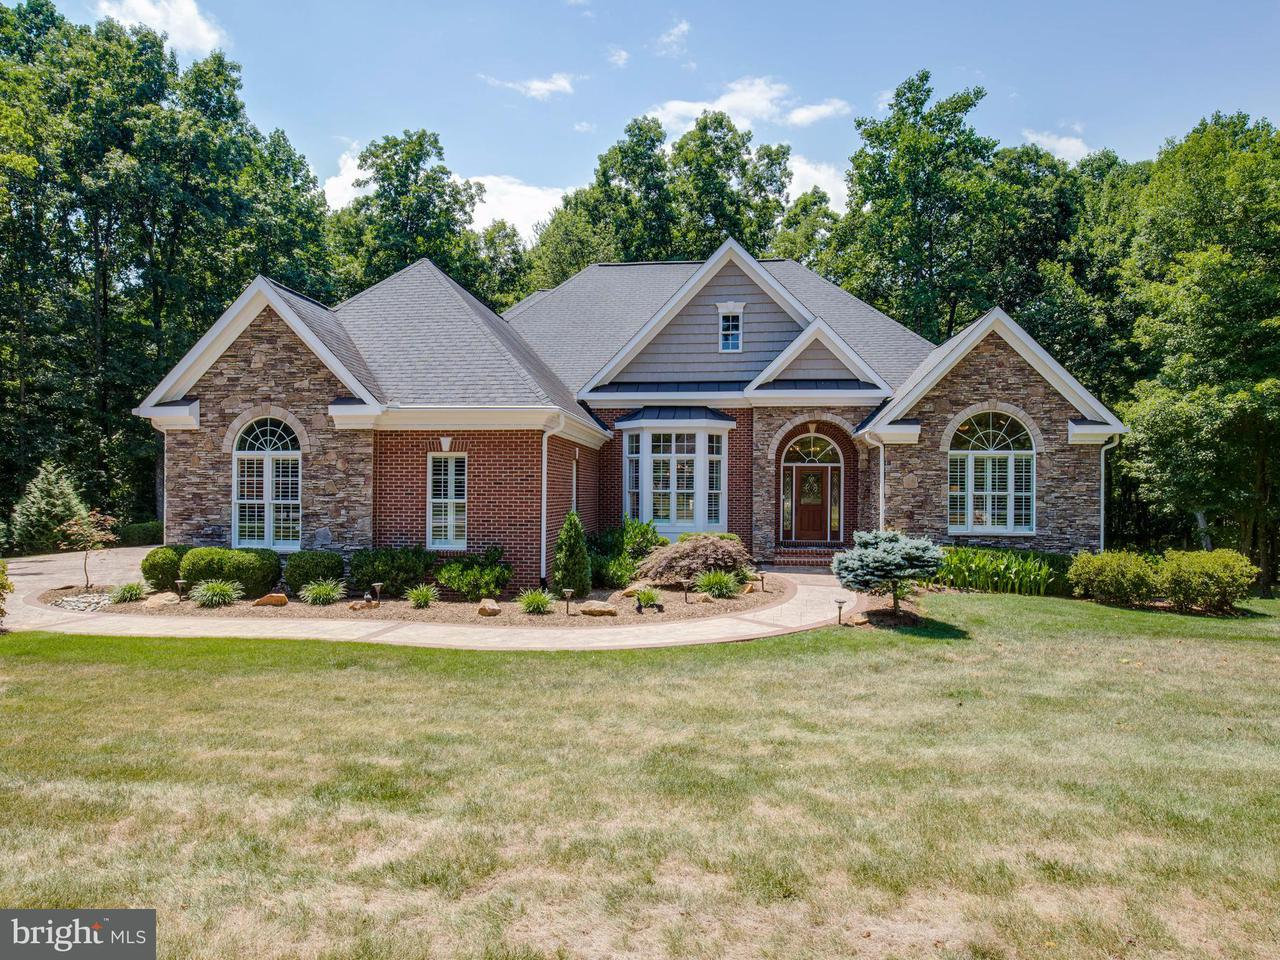 Casa Unifamiliar por un Venta en 15198 RILLHURST DRIVE 15198 RILLHURST DRIVE Culpeper, Virginia 22701 Estados Unidos